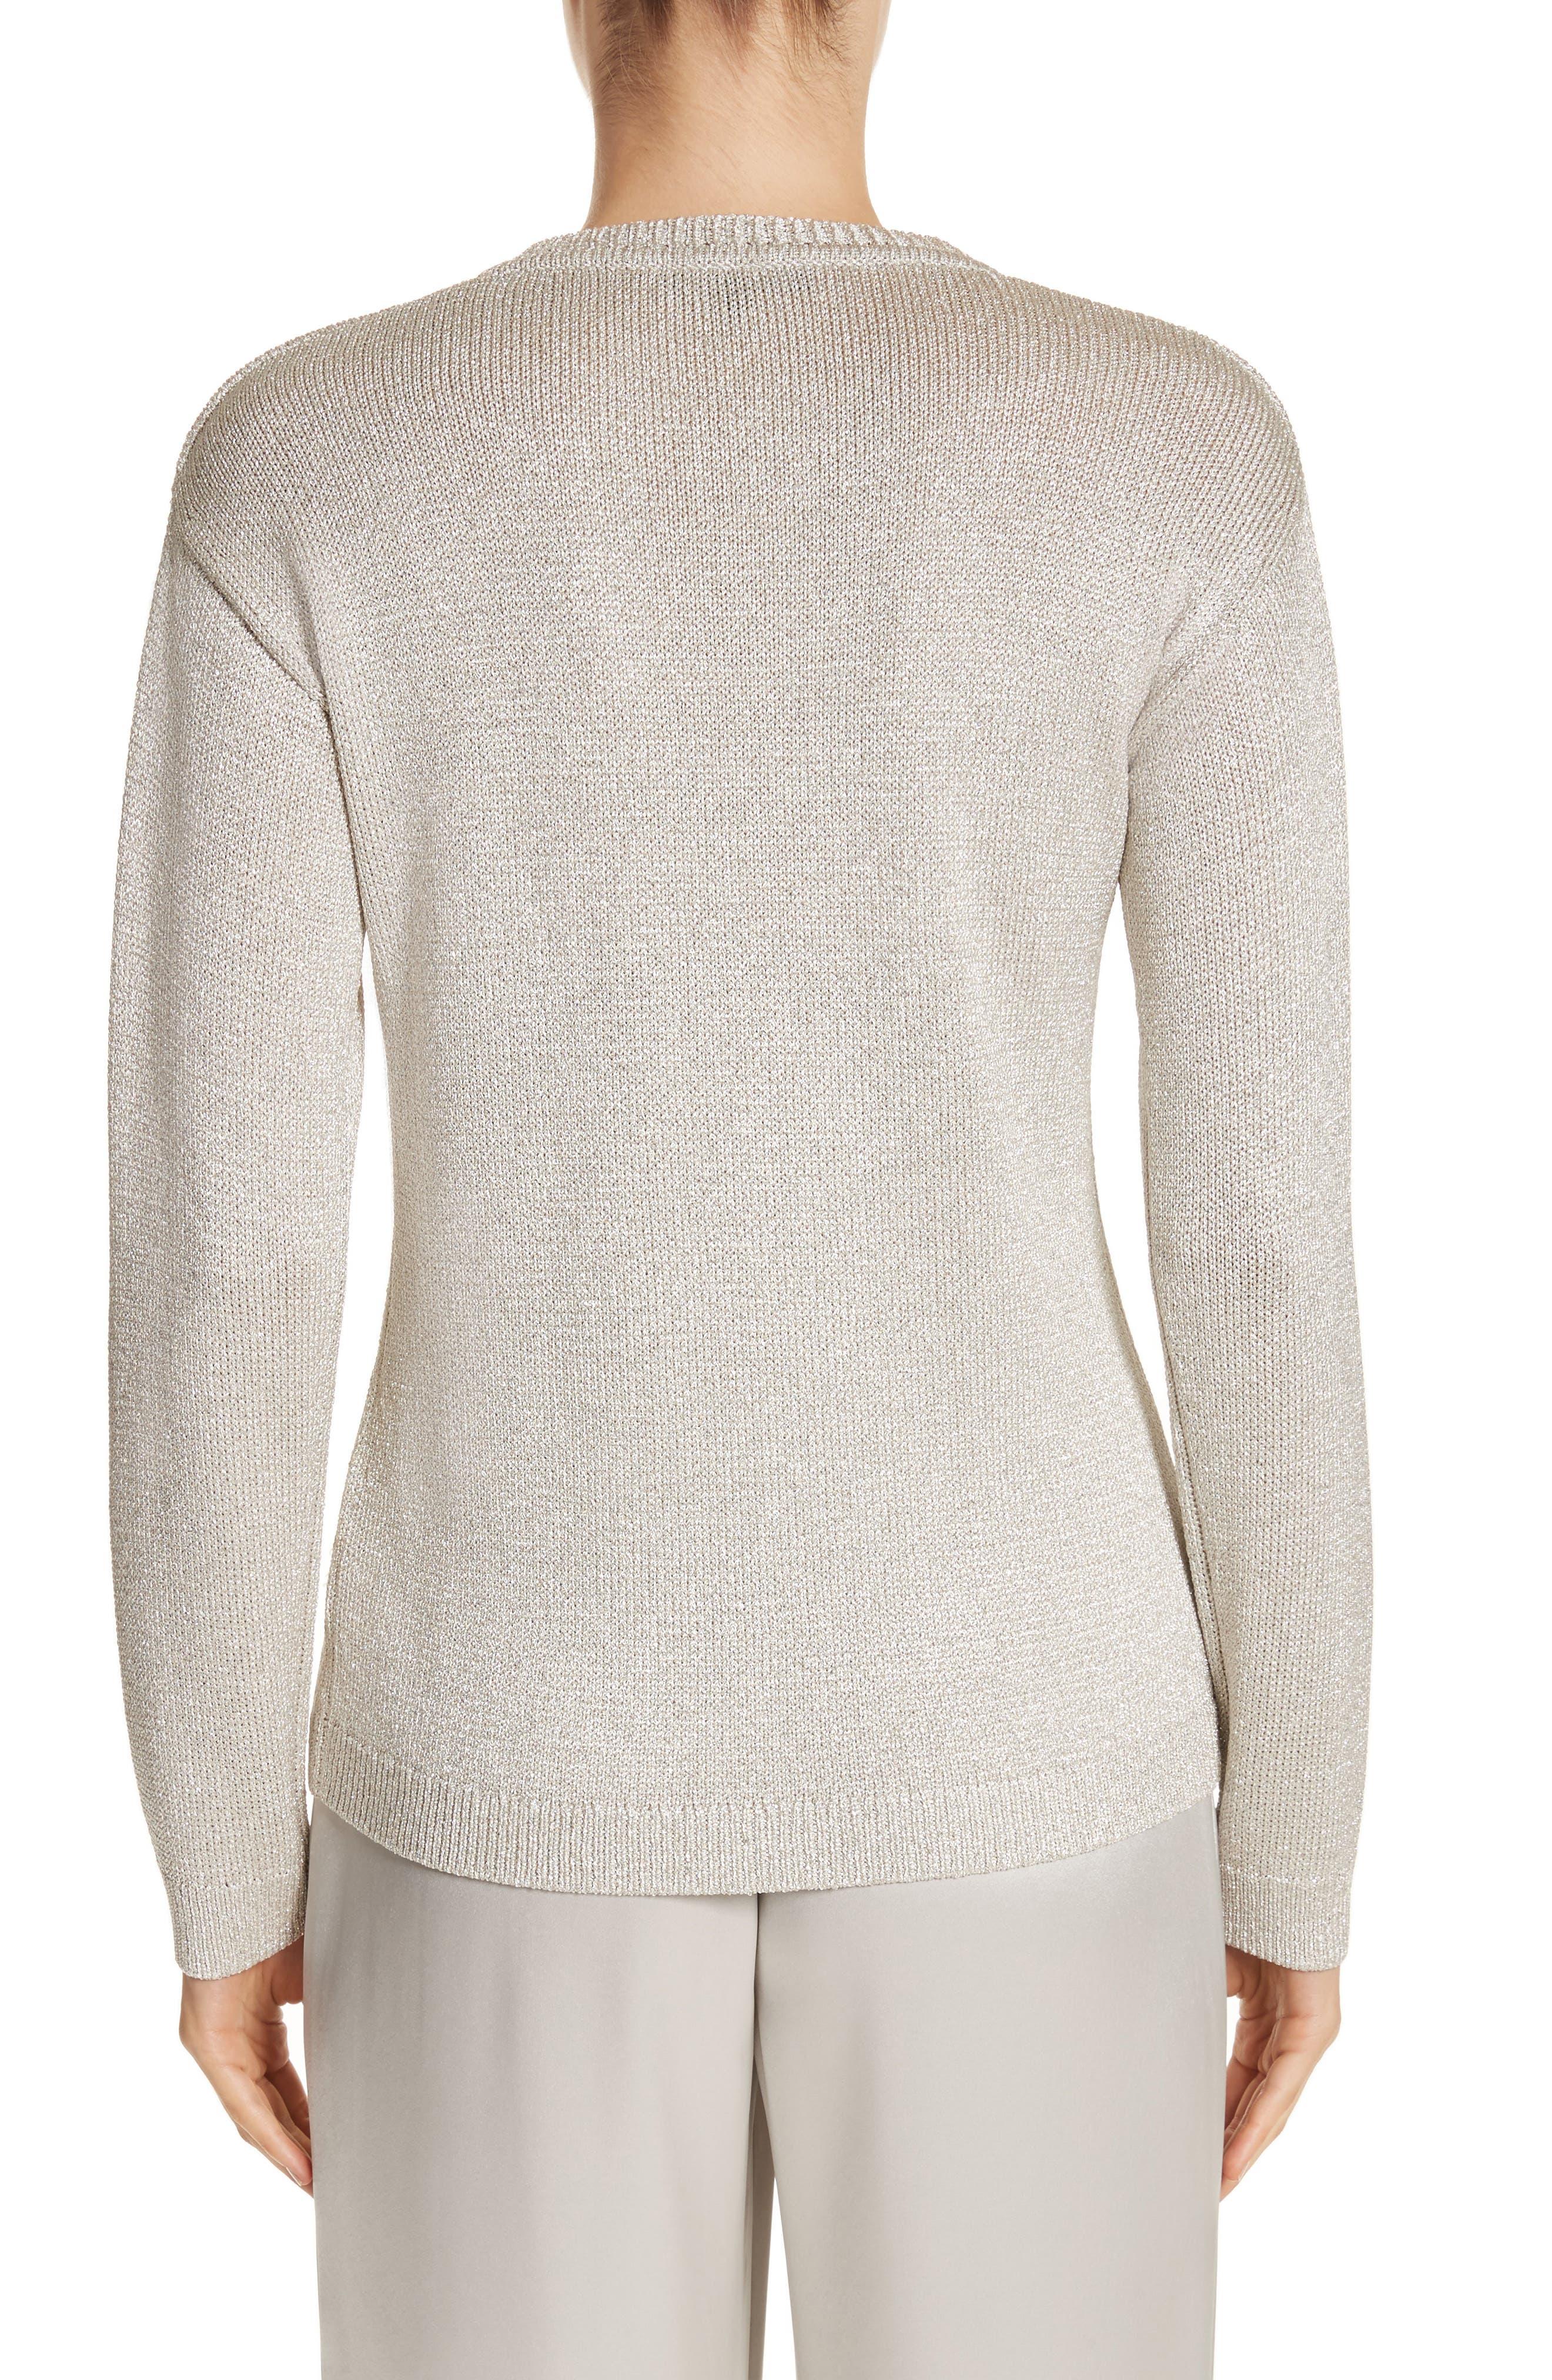 St John Collection Metallic Jersey Knit Sweater,                             Alternate thumbnail 2, color,                             020